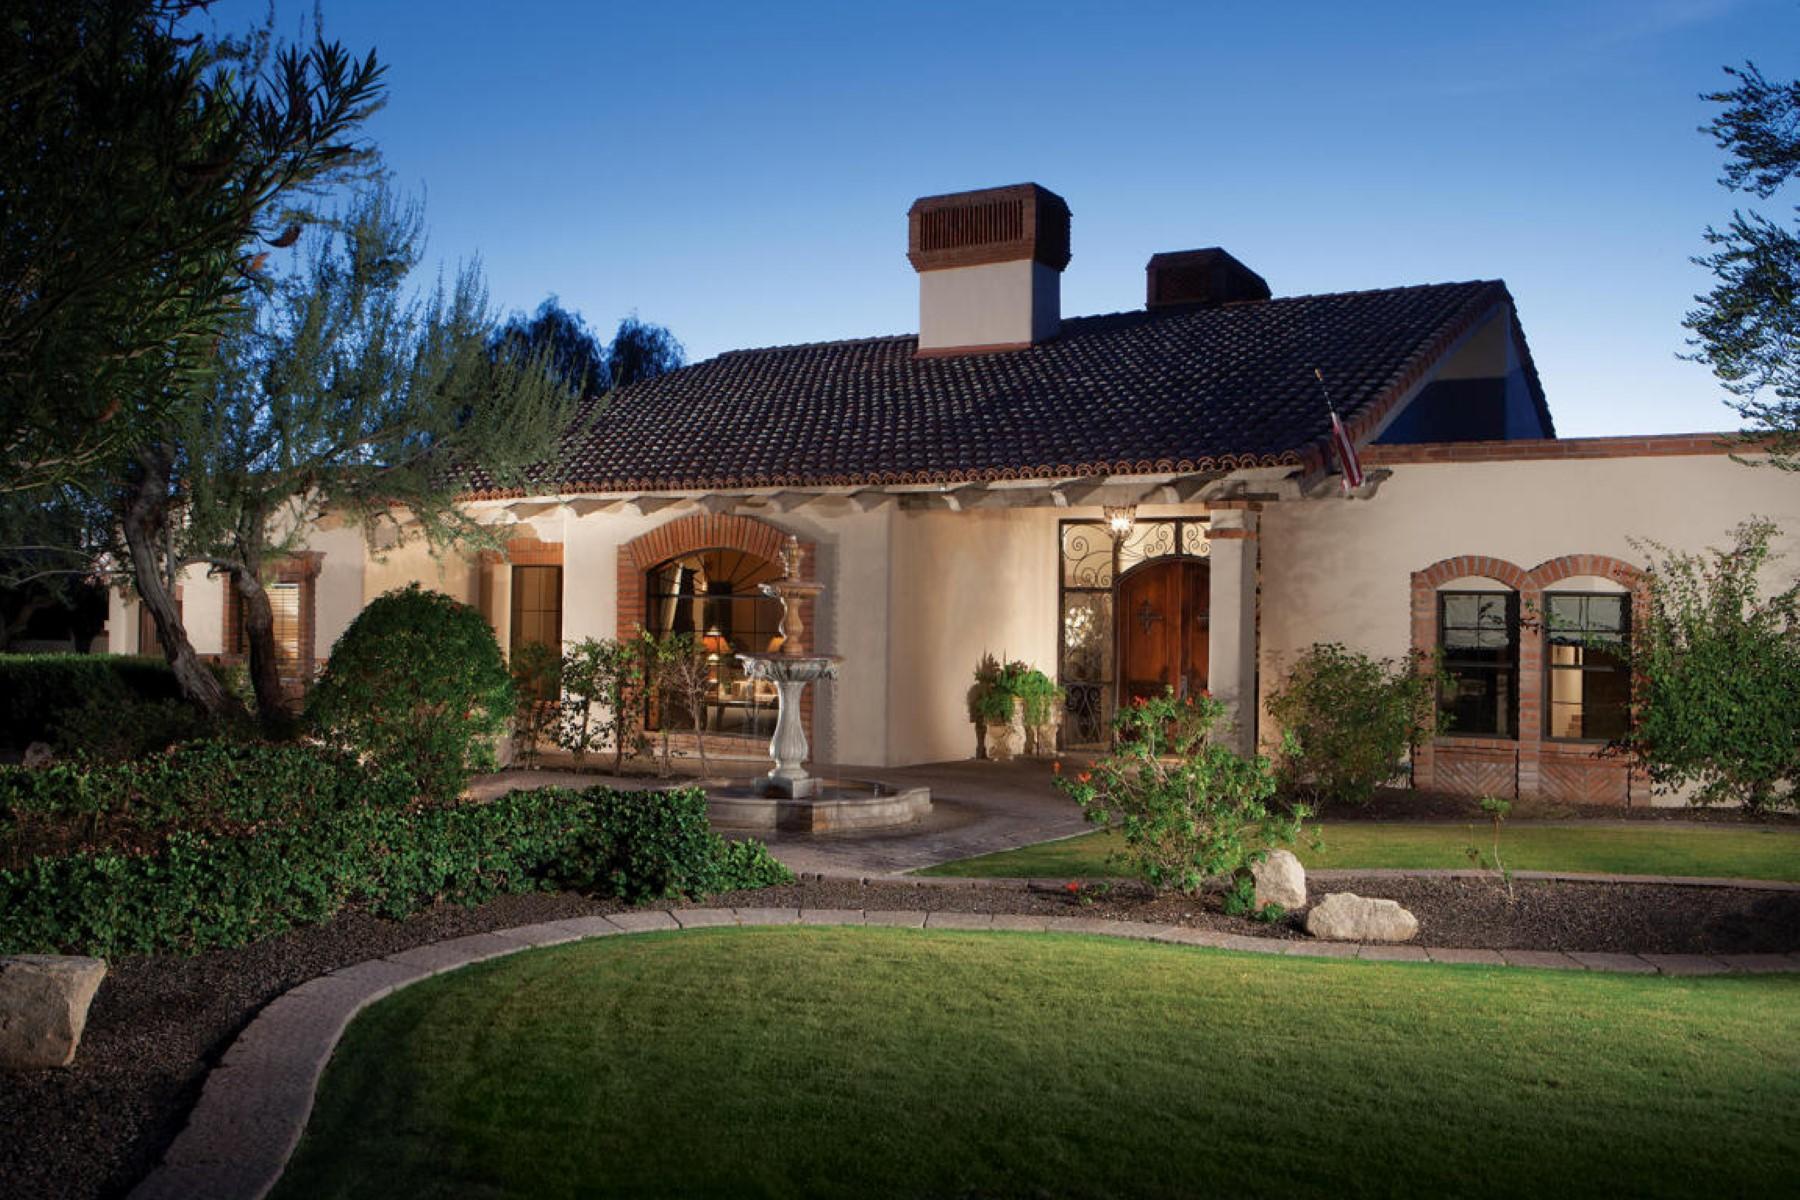 獨棟家庭住宅 為 出售 在 Impressively remodeled classic spanish home. 5824 N 33RD PL Paradise Valley, 亞利桑那州, 85253 美國